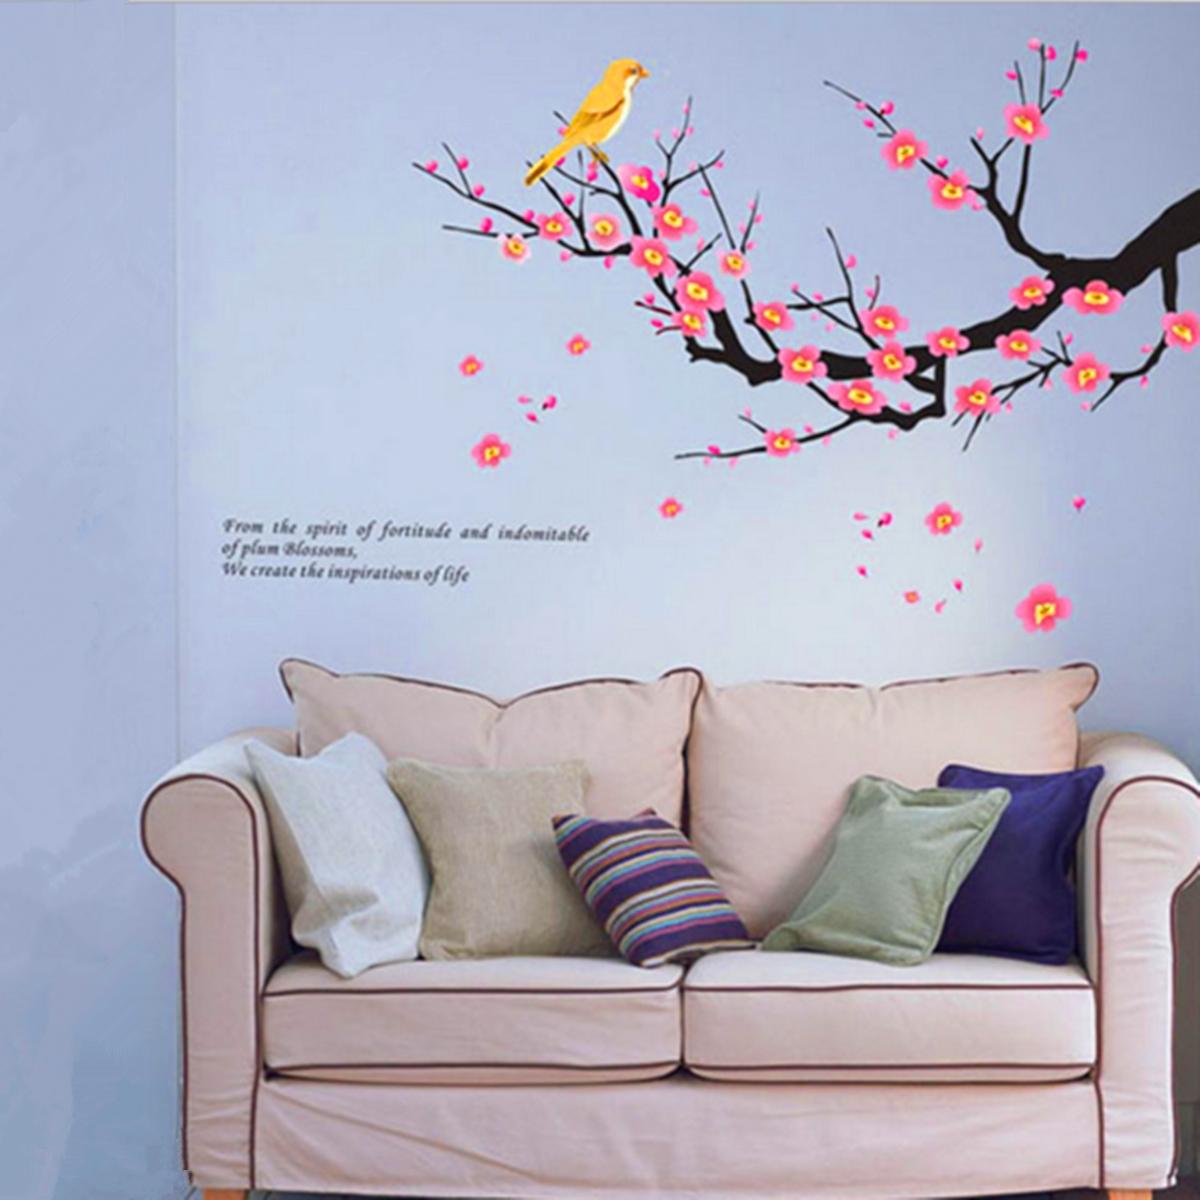 Dessin animal arbre sticker mural autocollant amovible for Autocollant mural arbre